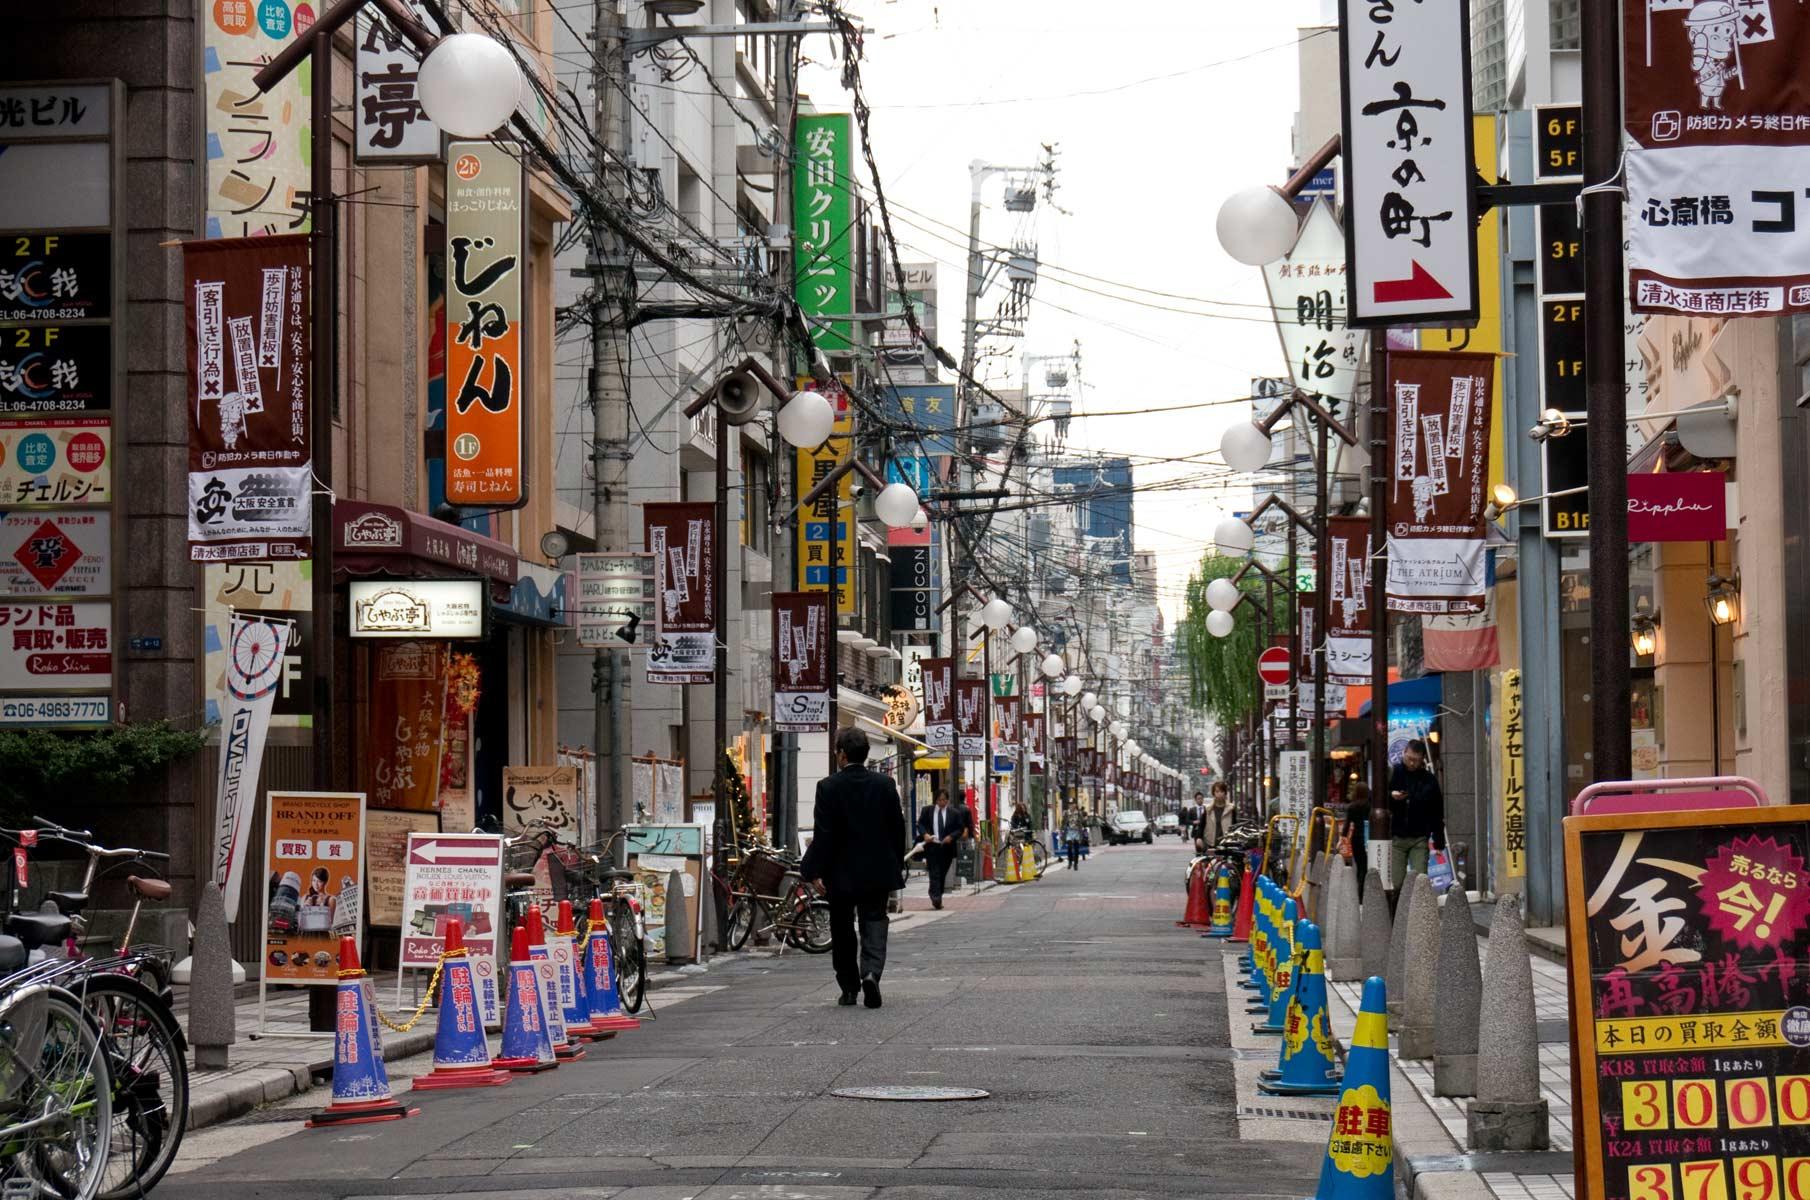 Straßenszene mit viel Reklame in Dotonbori Osaka, Japan